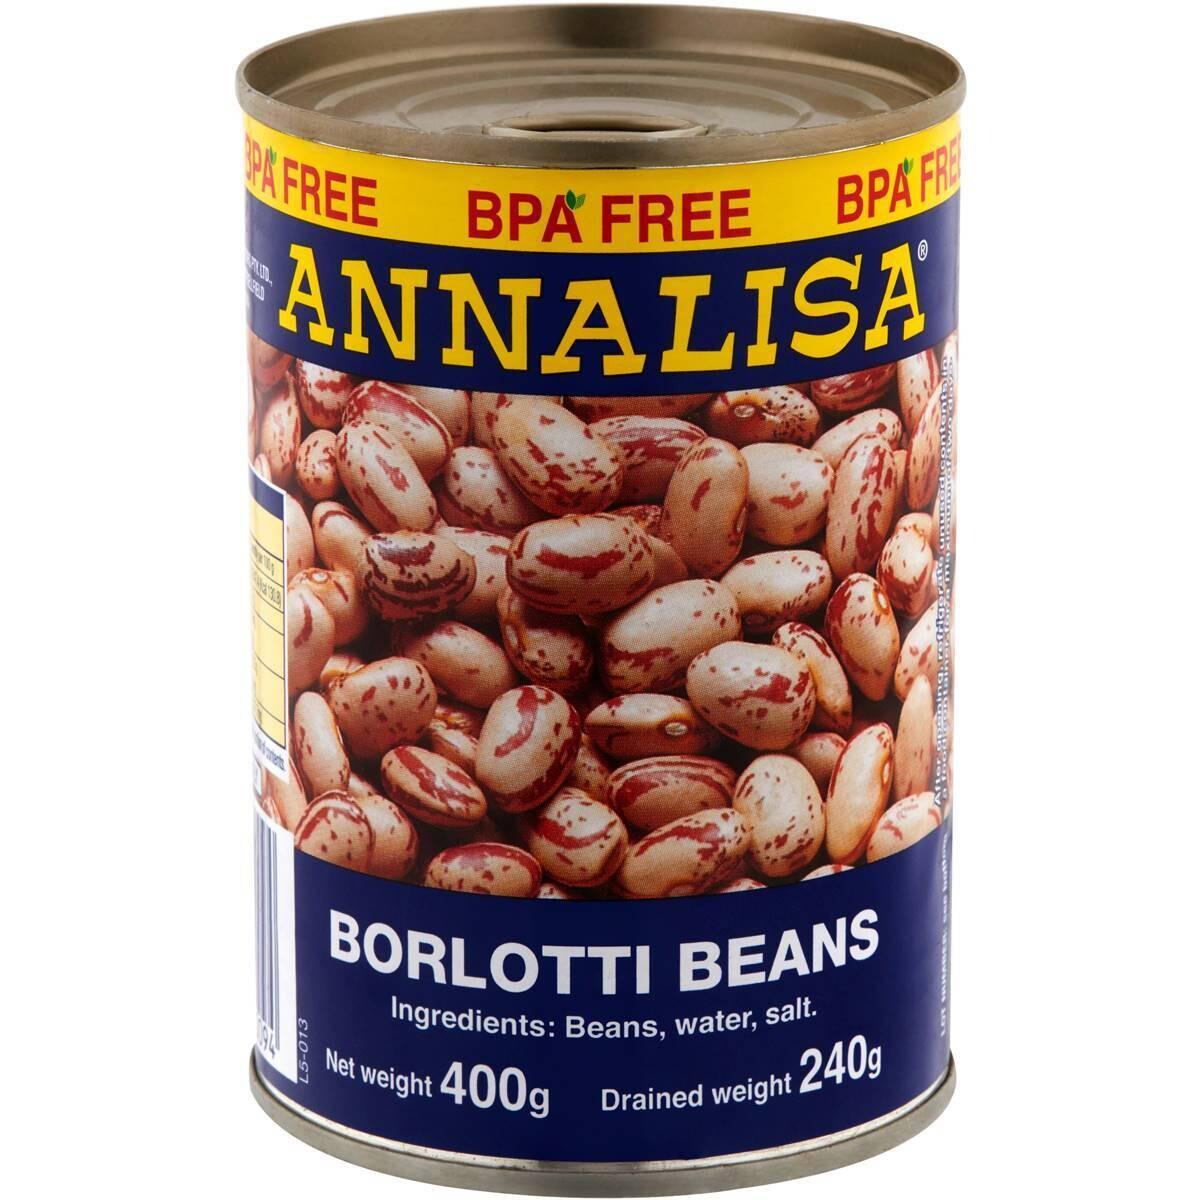 ANNALISA BORLOTTI BEANS